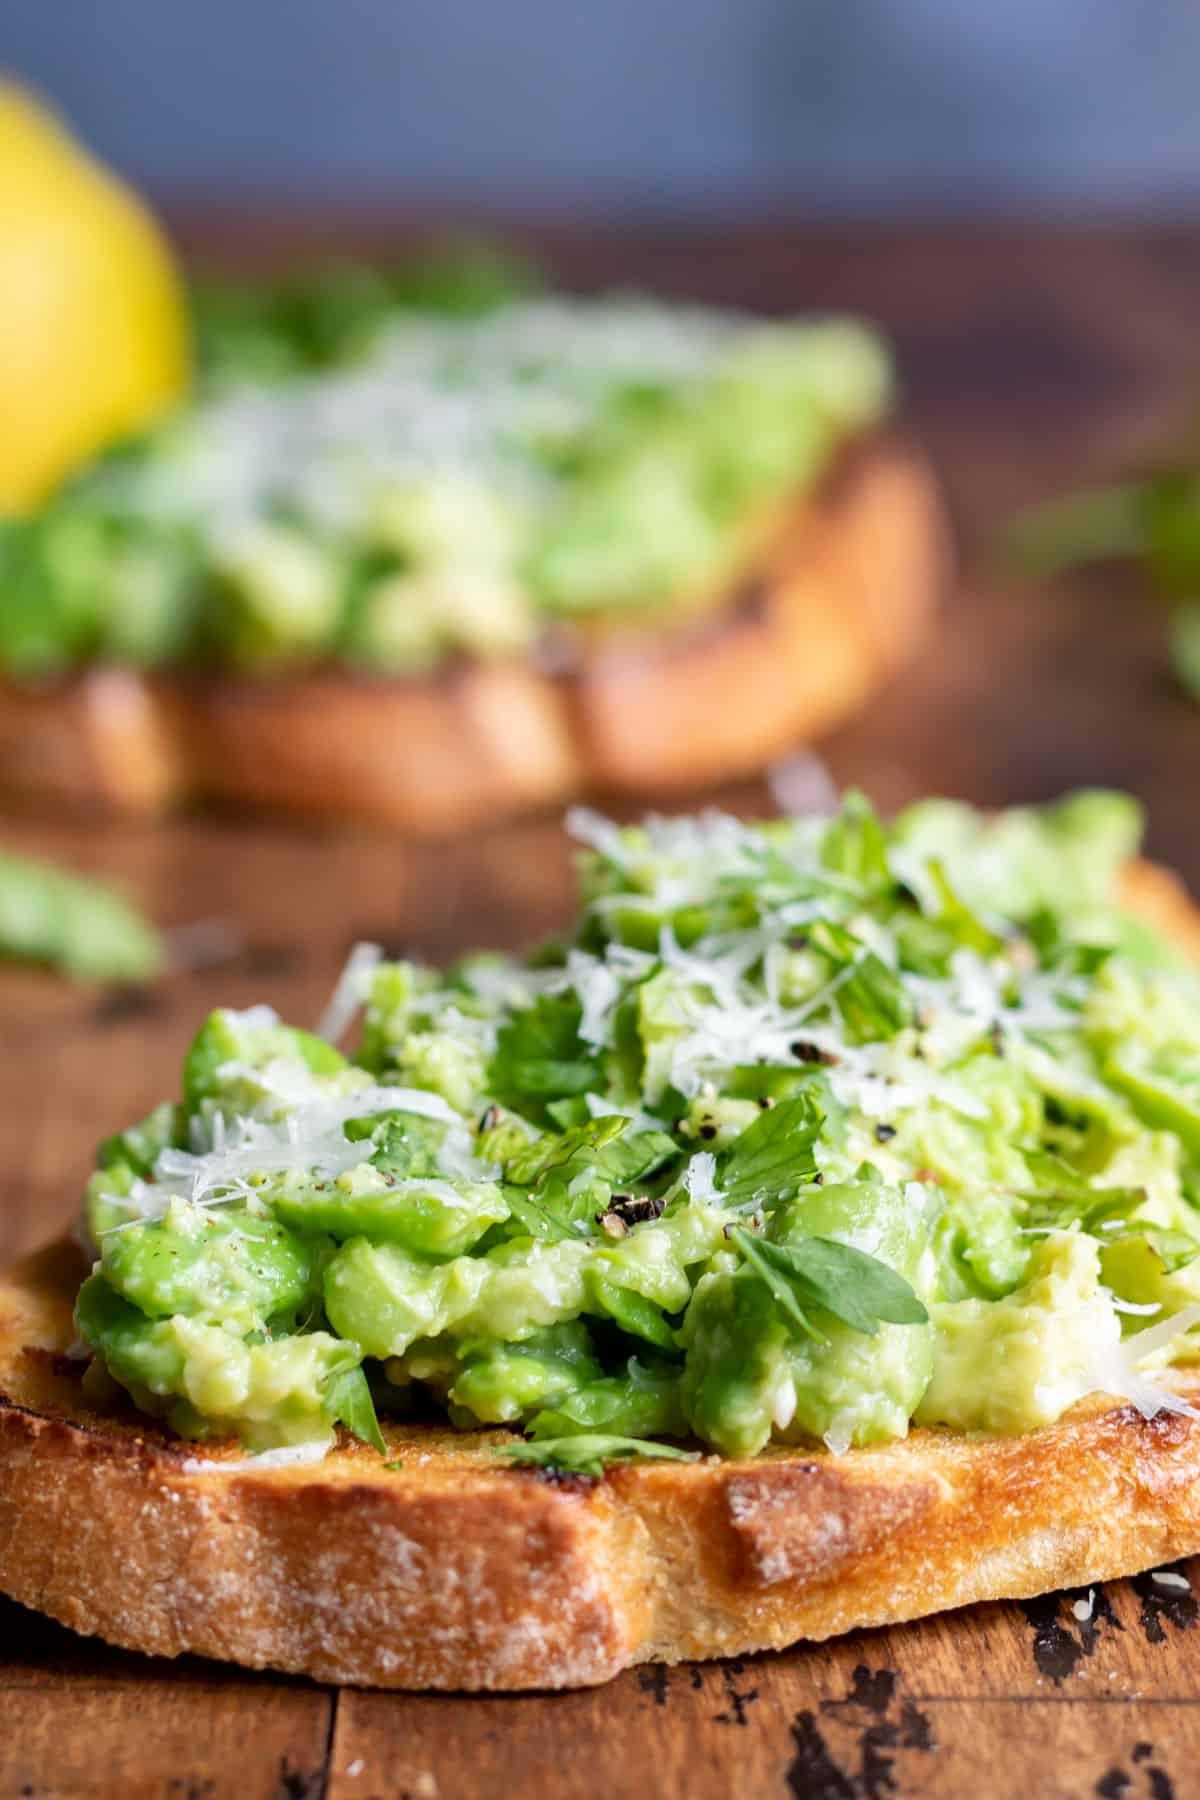 Avocado and bean mash on toast.